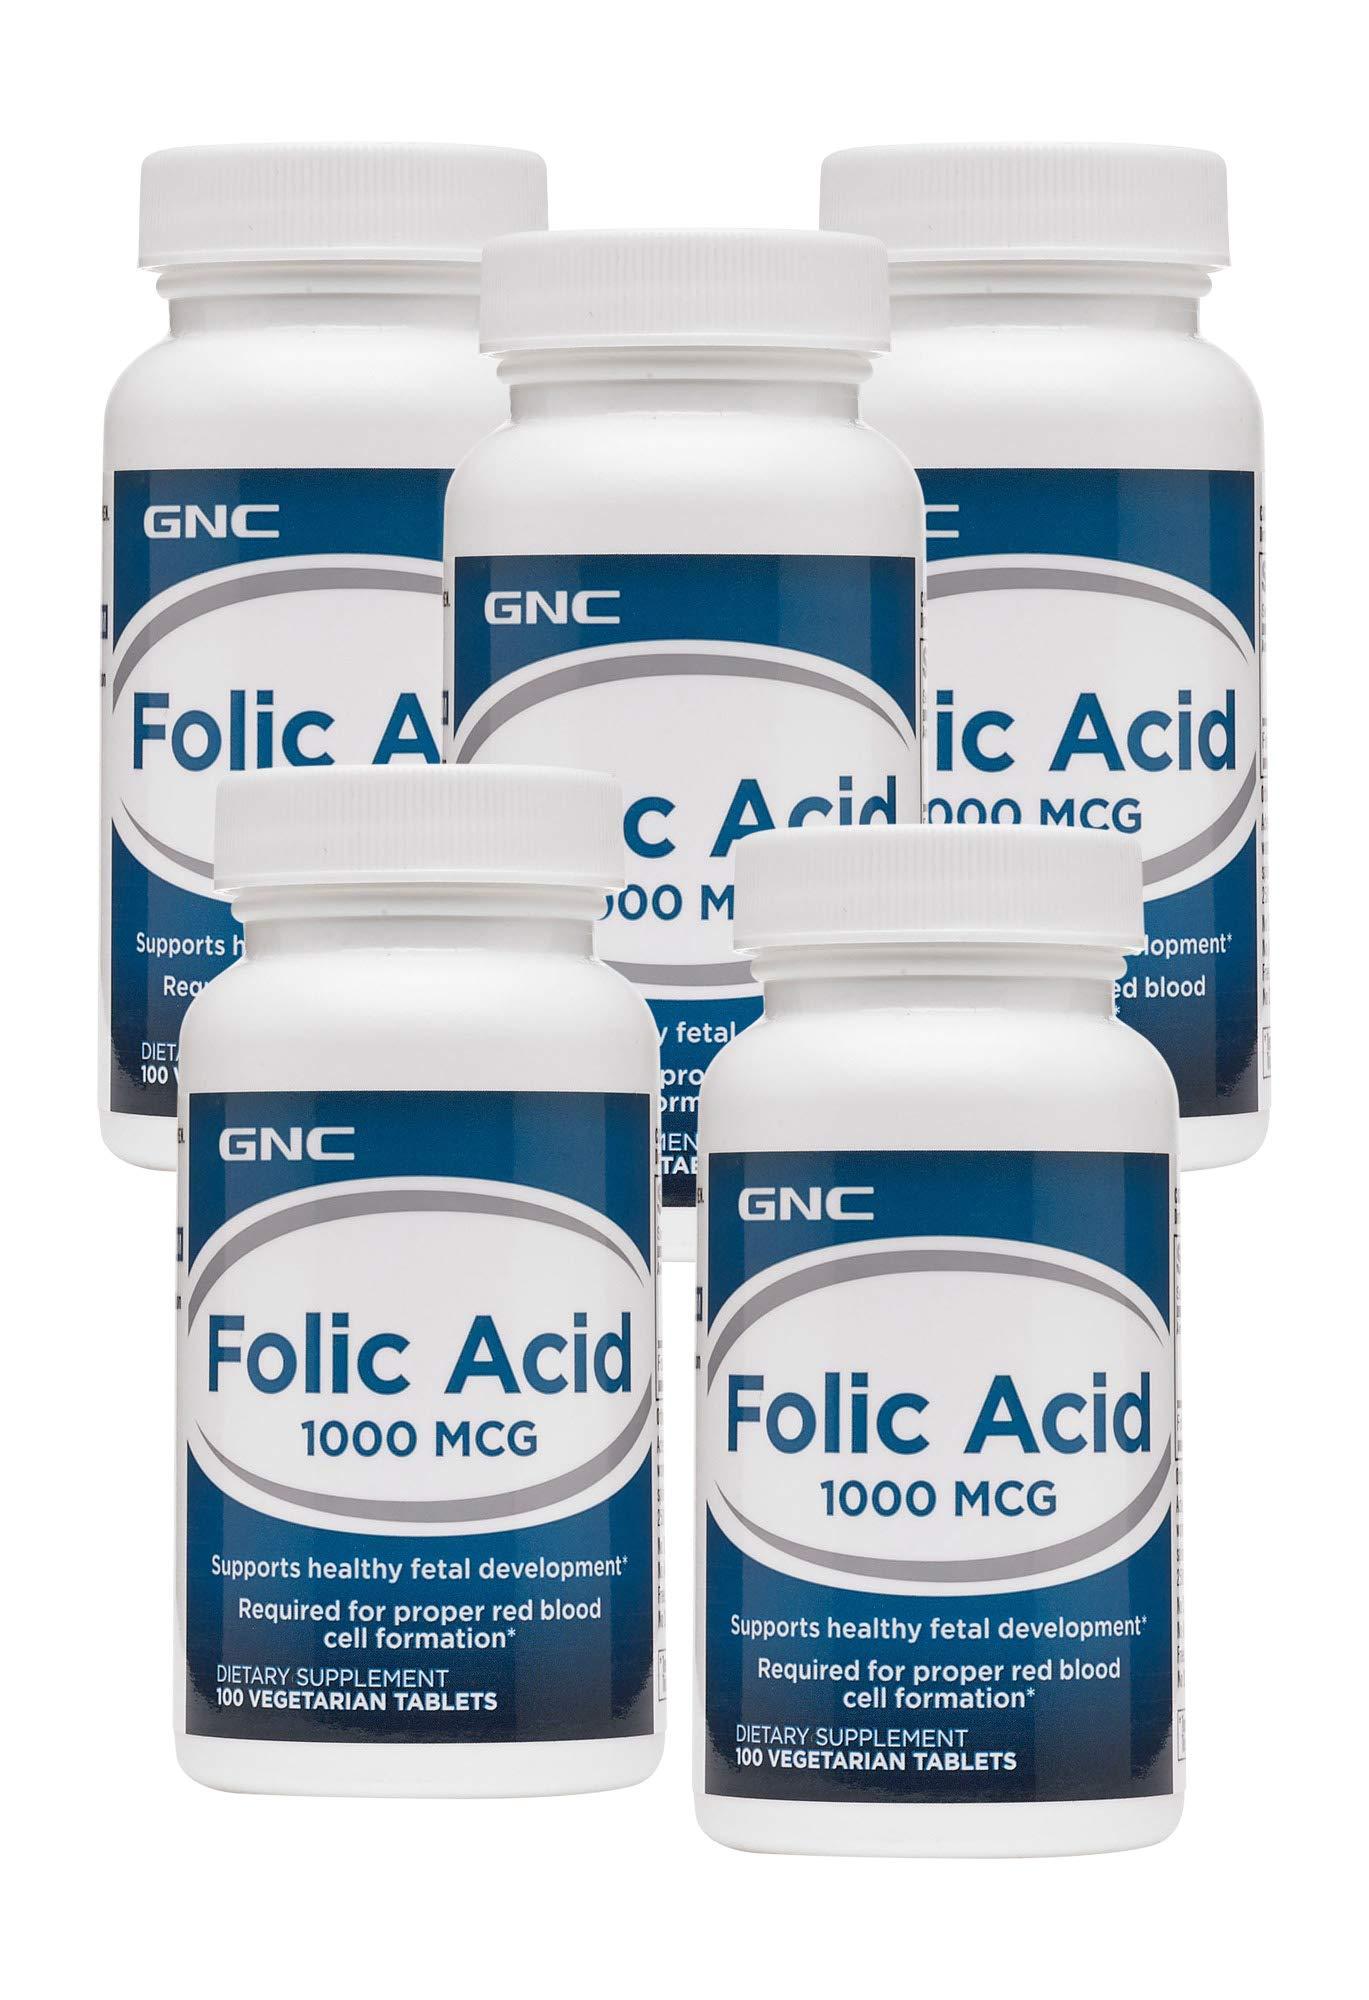 GNC Folic Acid 1000 MCG - 5 Pack